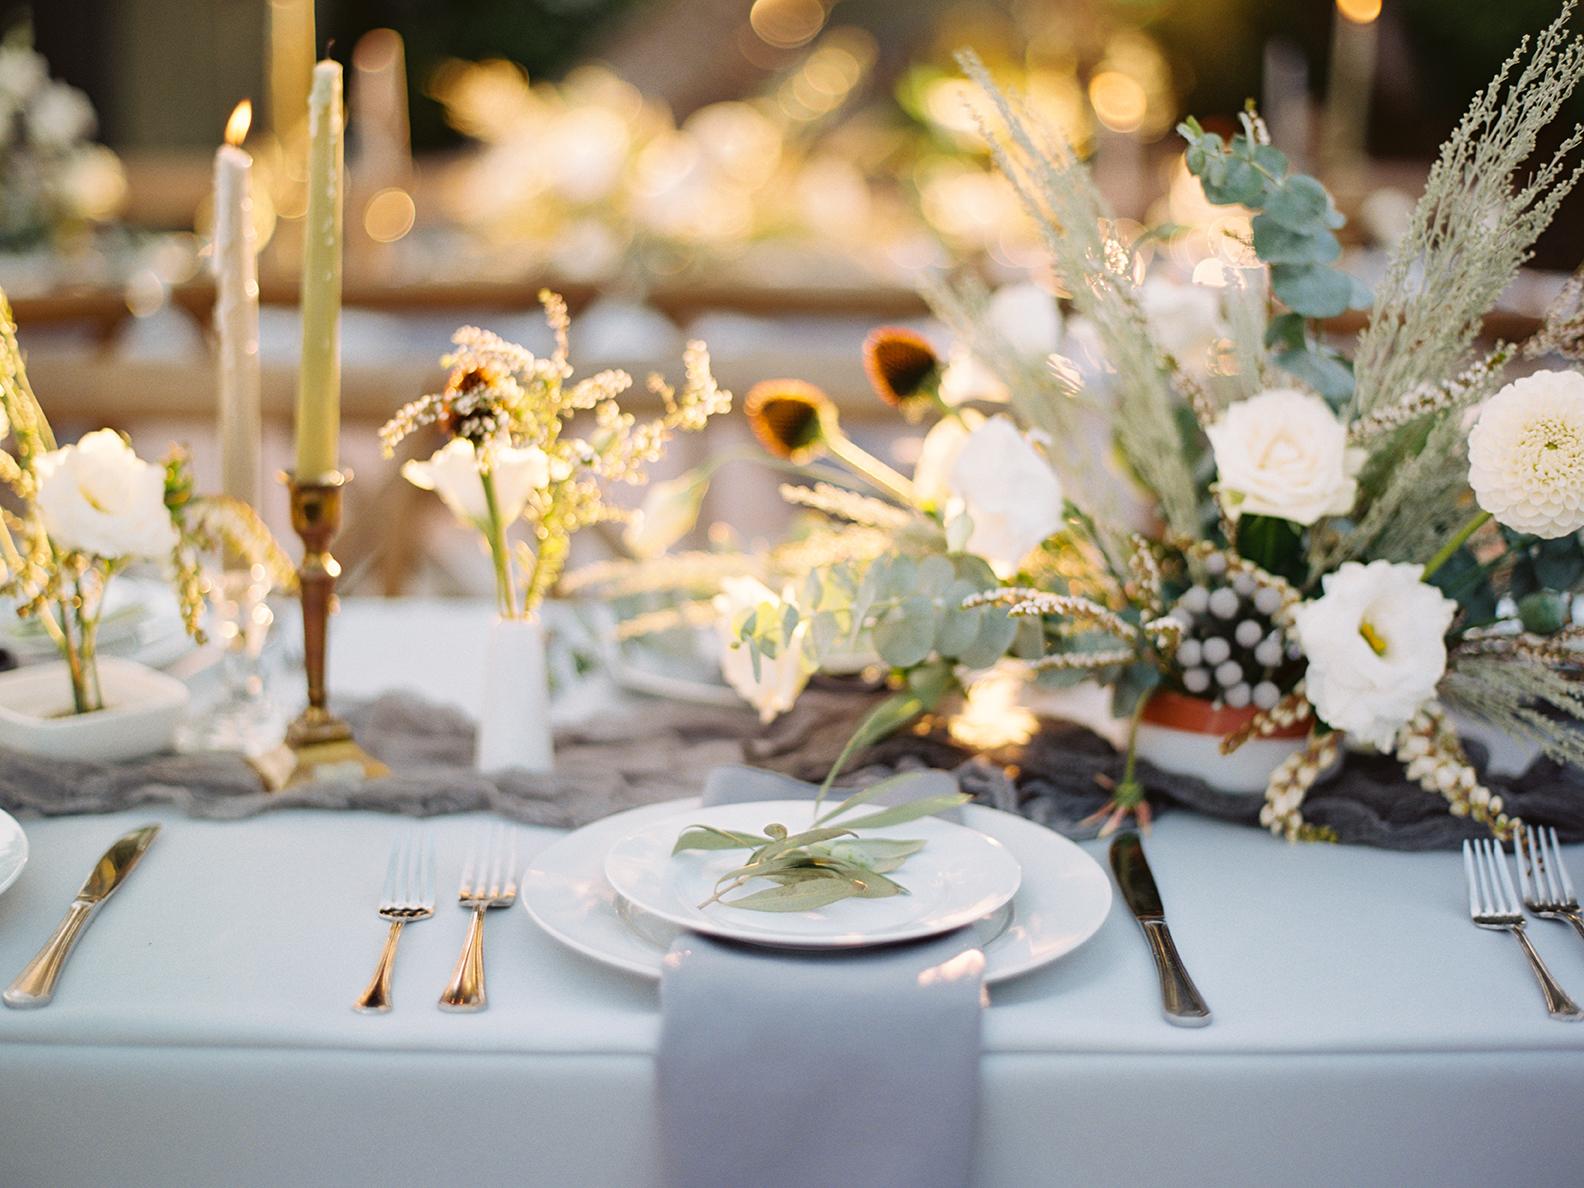 025-brian-sarra-los-angeles-wedding-brumley-wells-photography.jpg